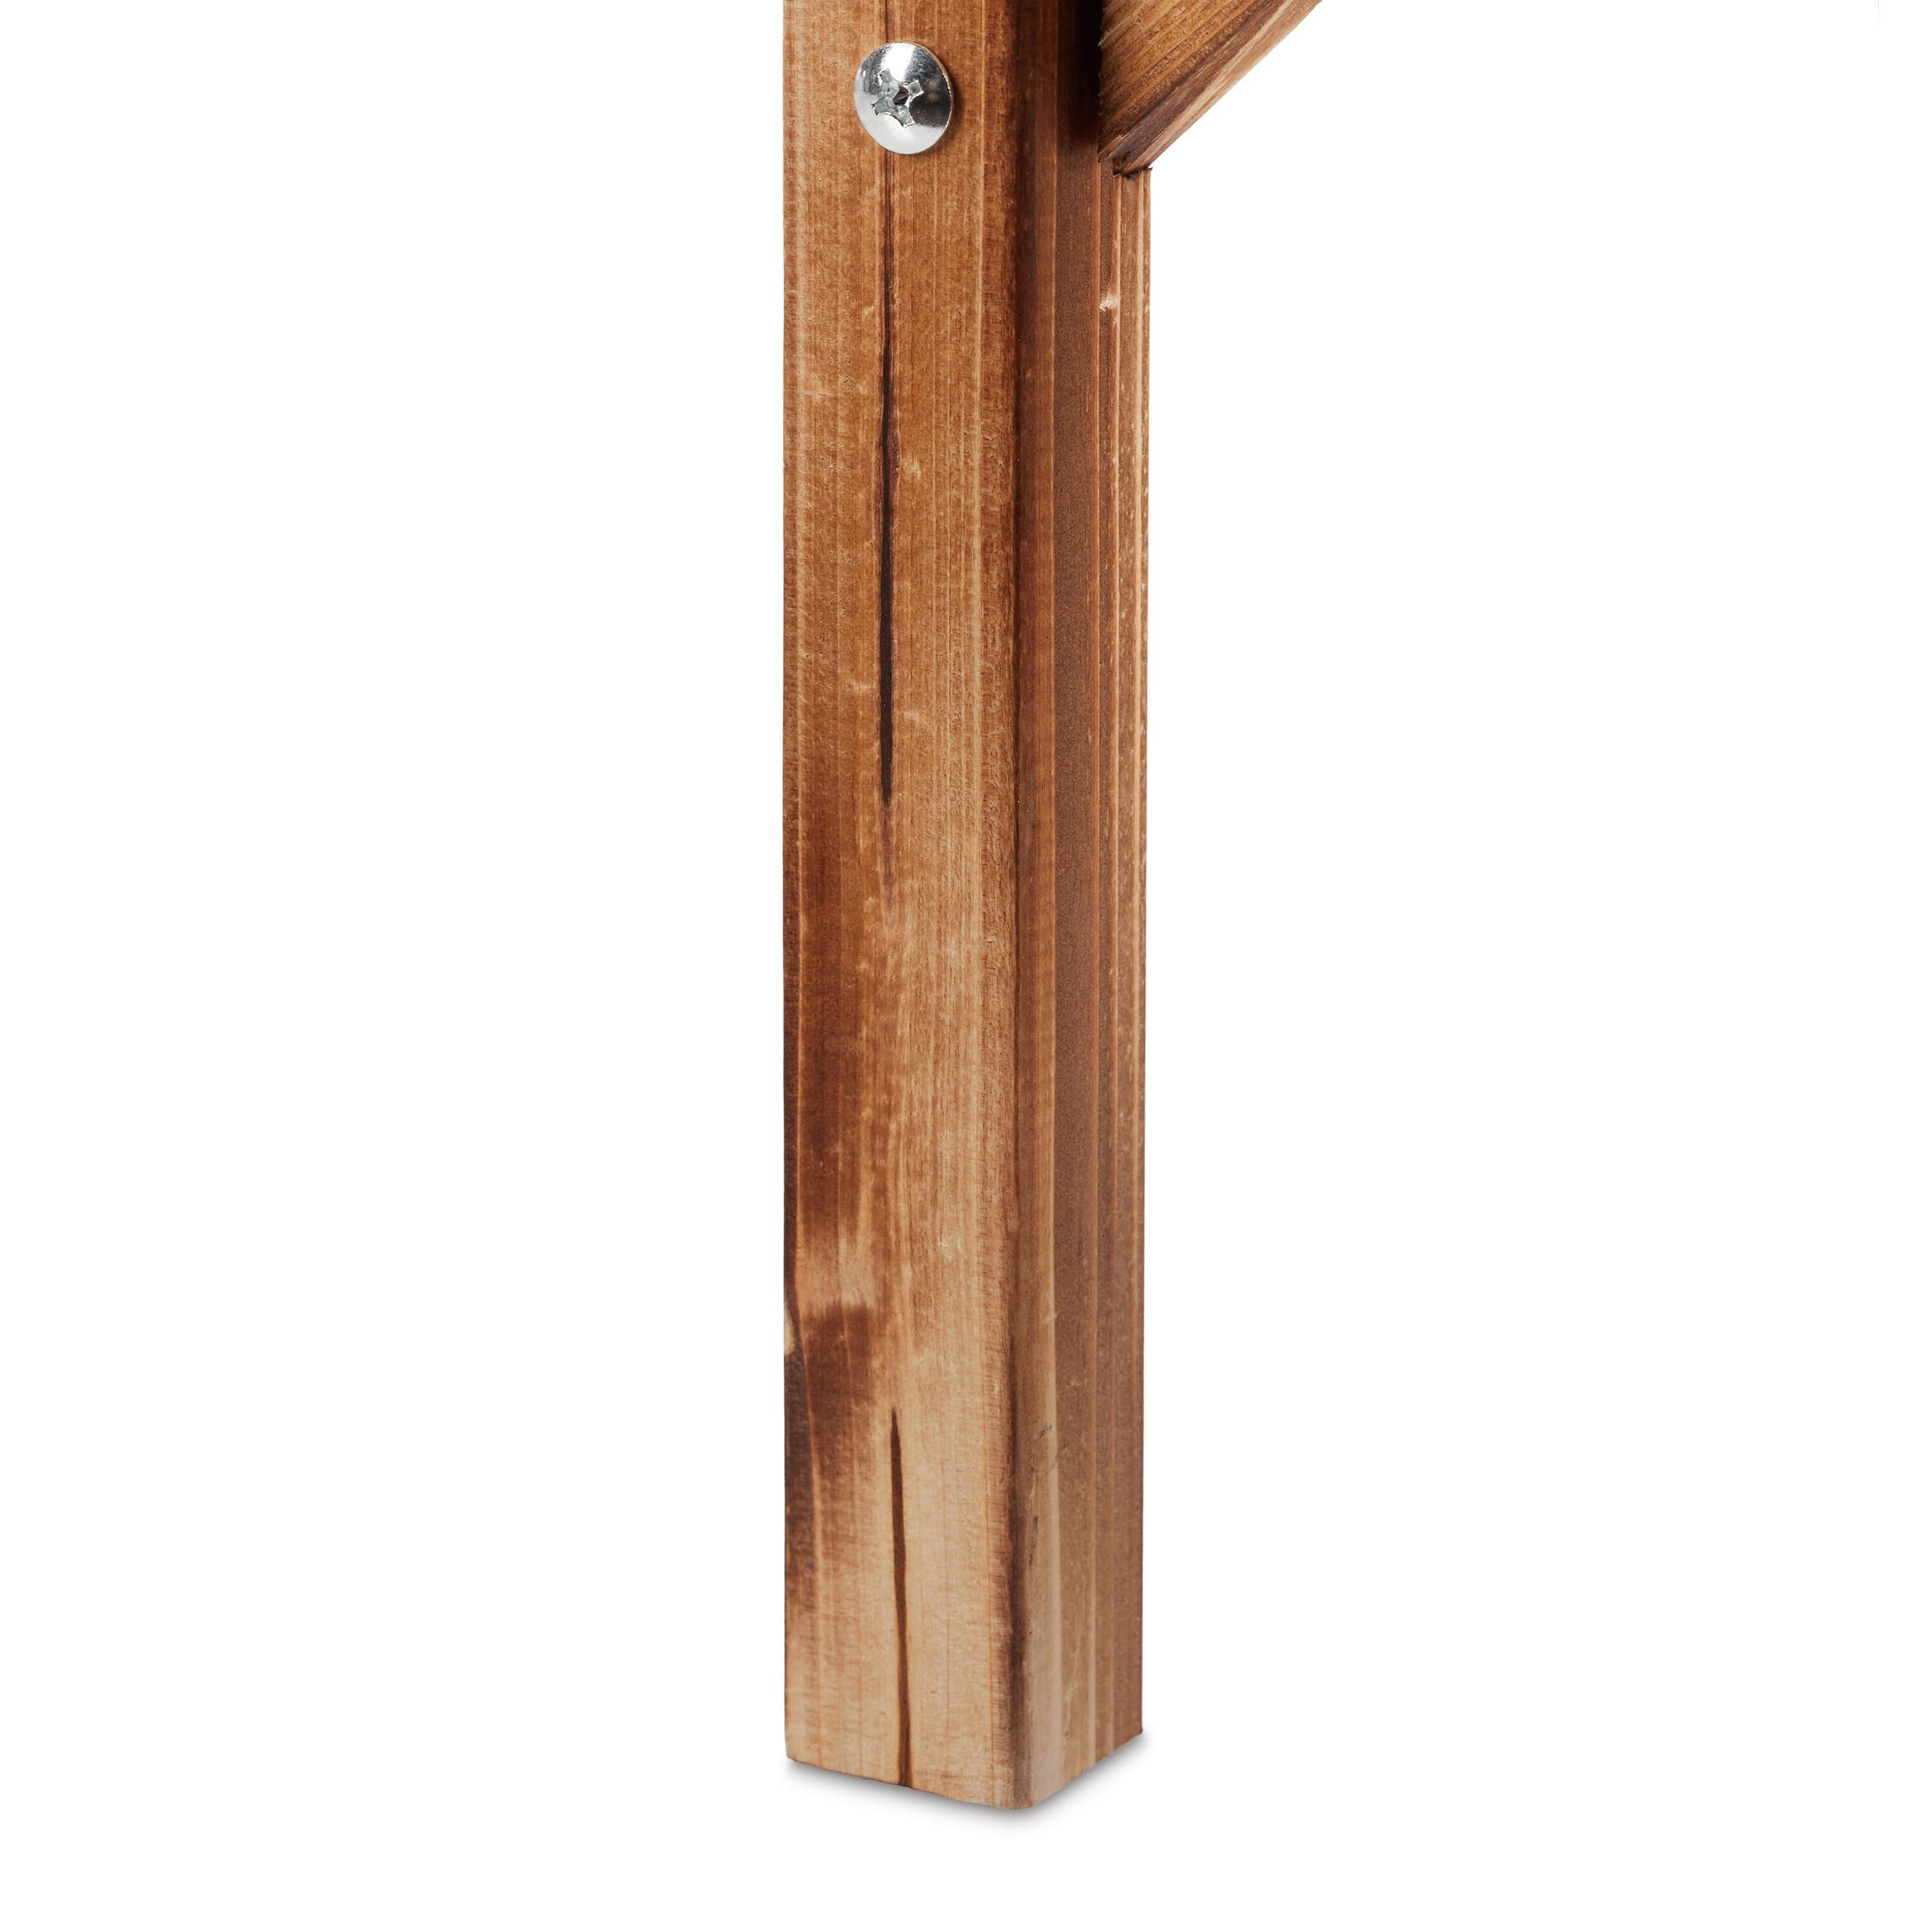 plantenrek-hout-plantentrap-plantenklimrek-bloemenrek-bloementrap miniatuur 8